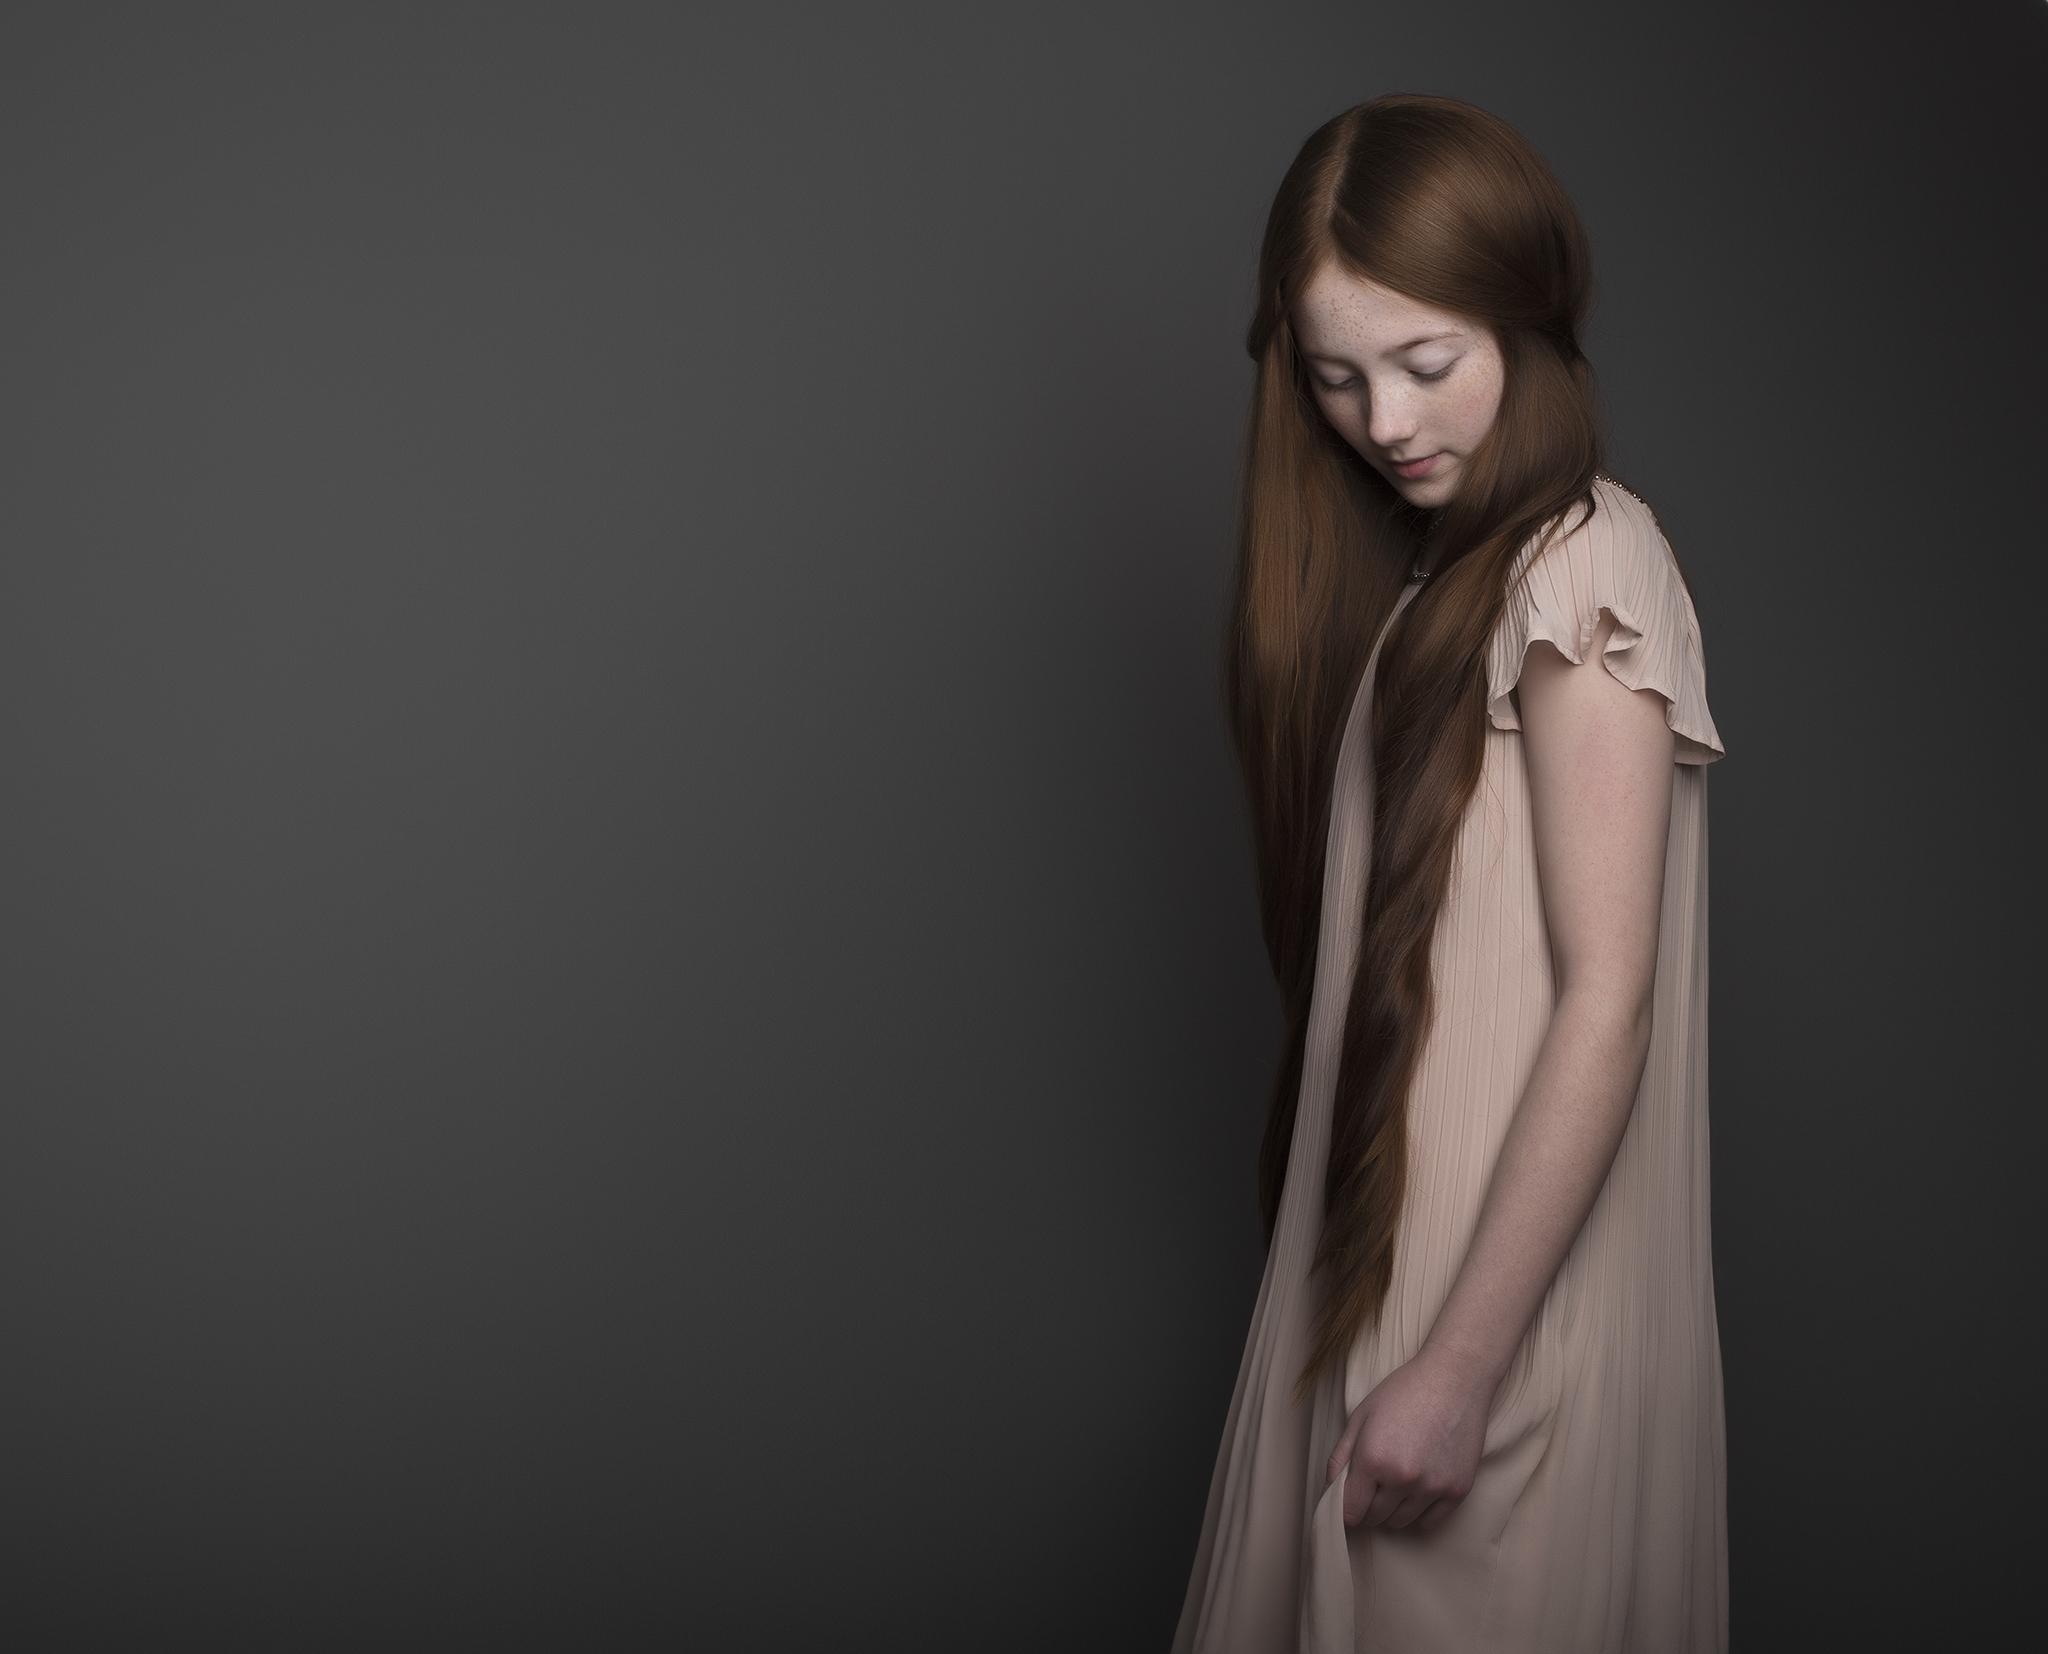 elizabethgphotography_childrens_fineart_kingslangley_hertfordshire_model_lilycave_3.jpg